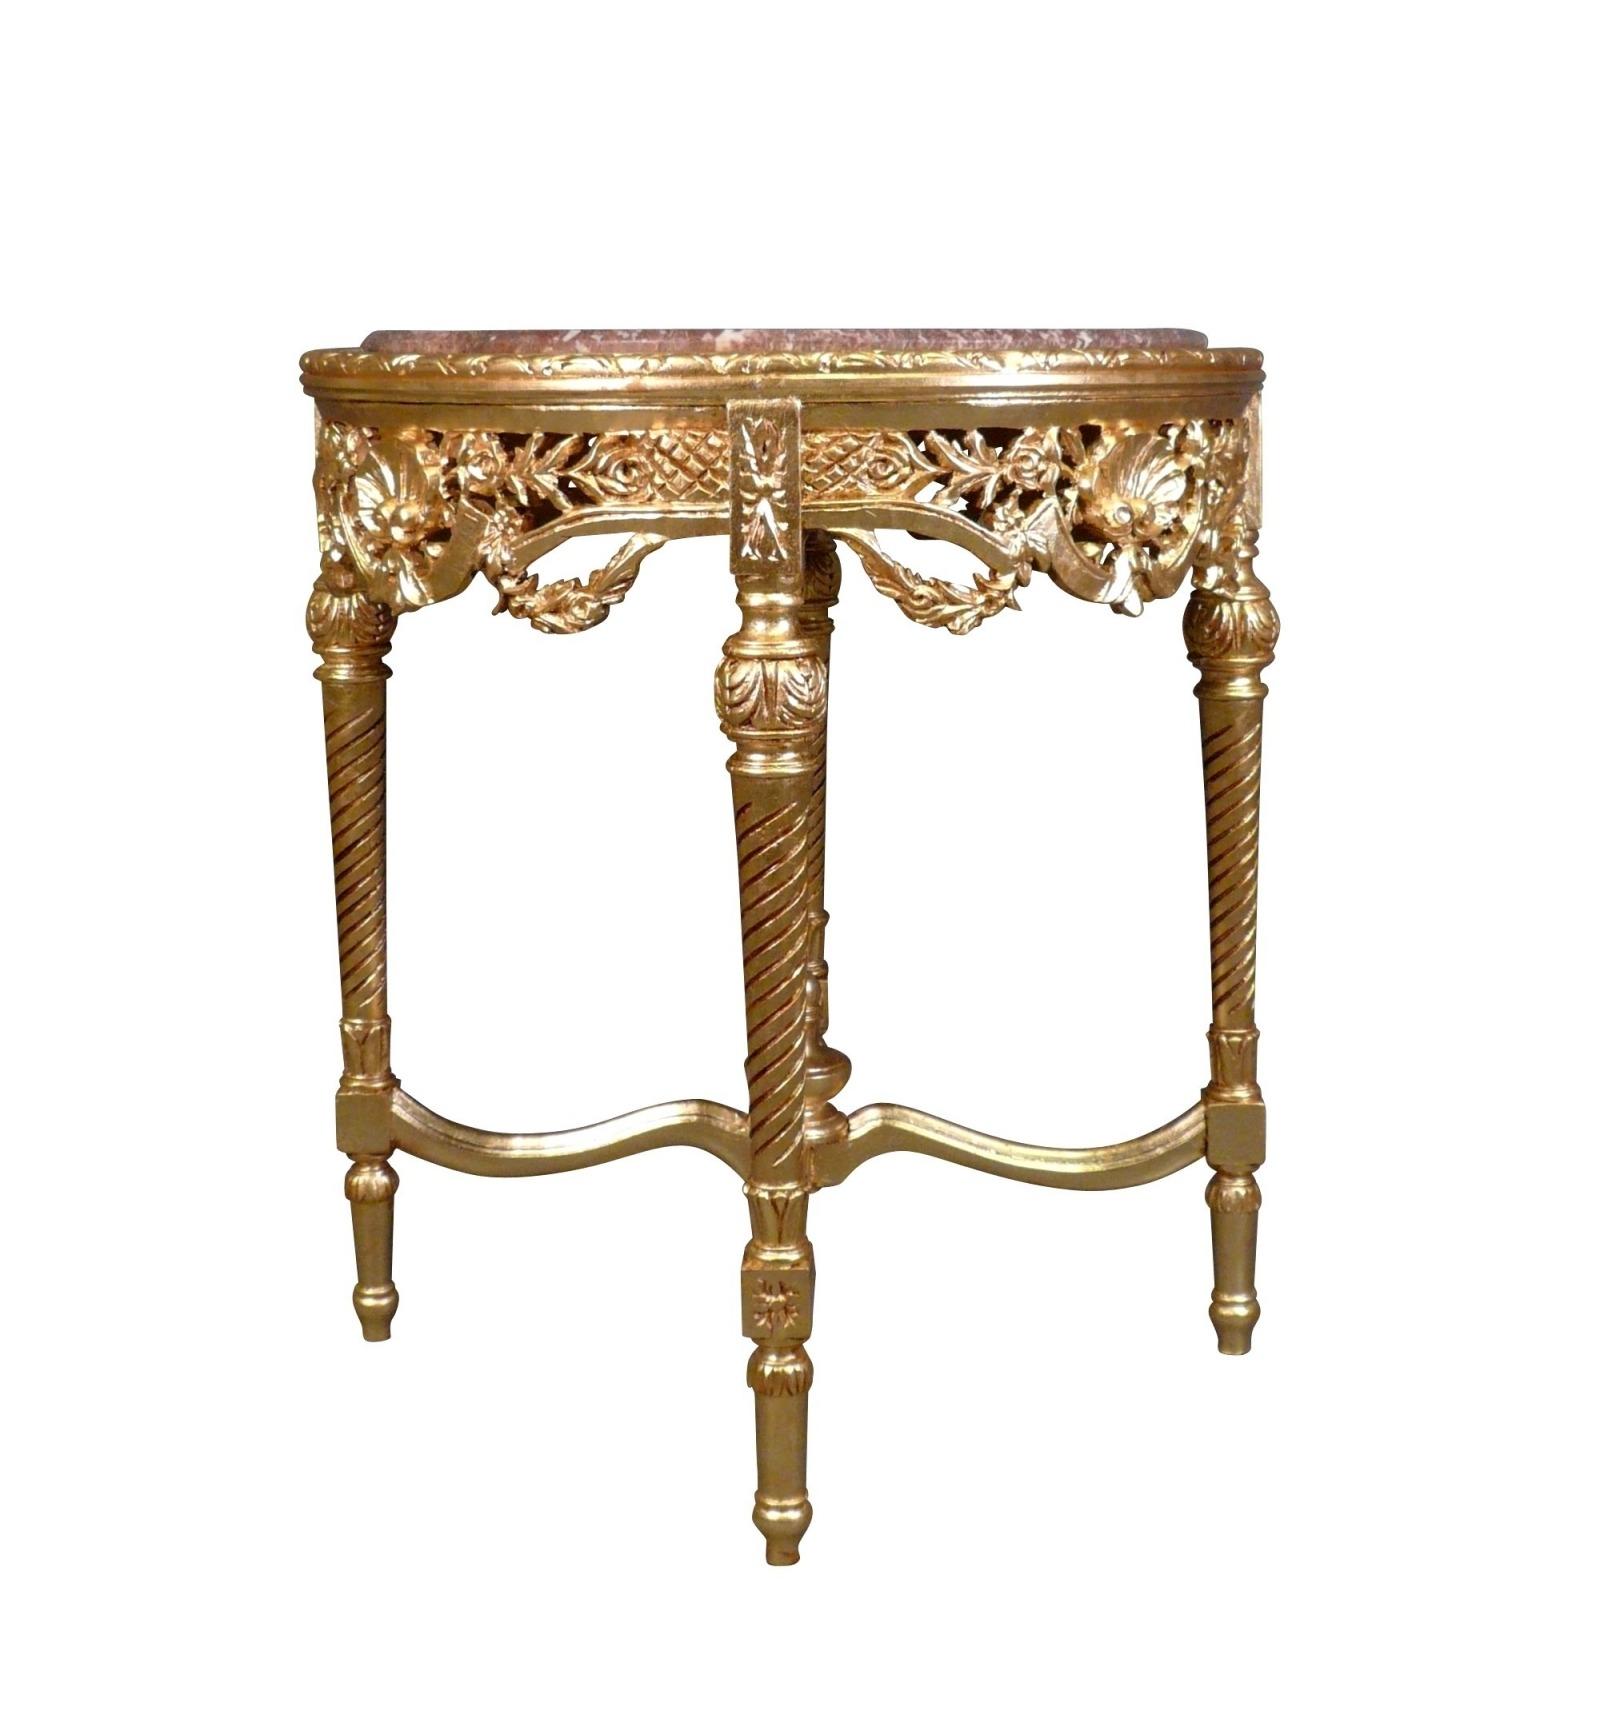 esstisch barock aus vergoldetem holz und marmor top. Black Bedroom Furniture Sets. Home Design Ideas